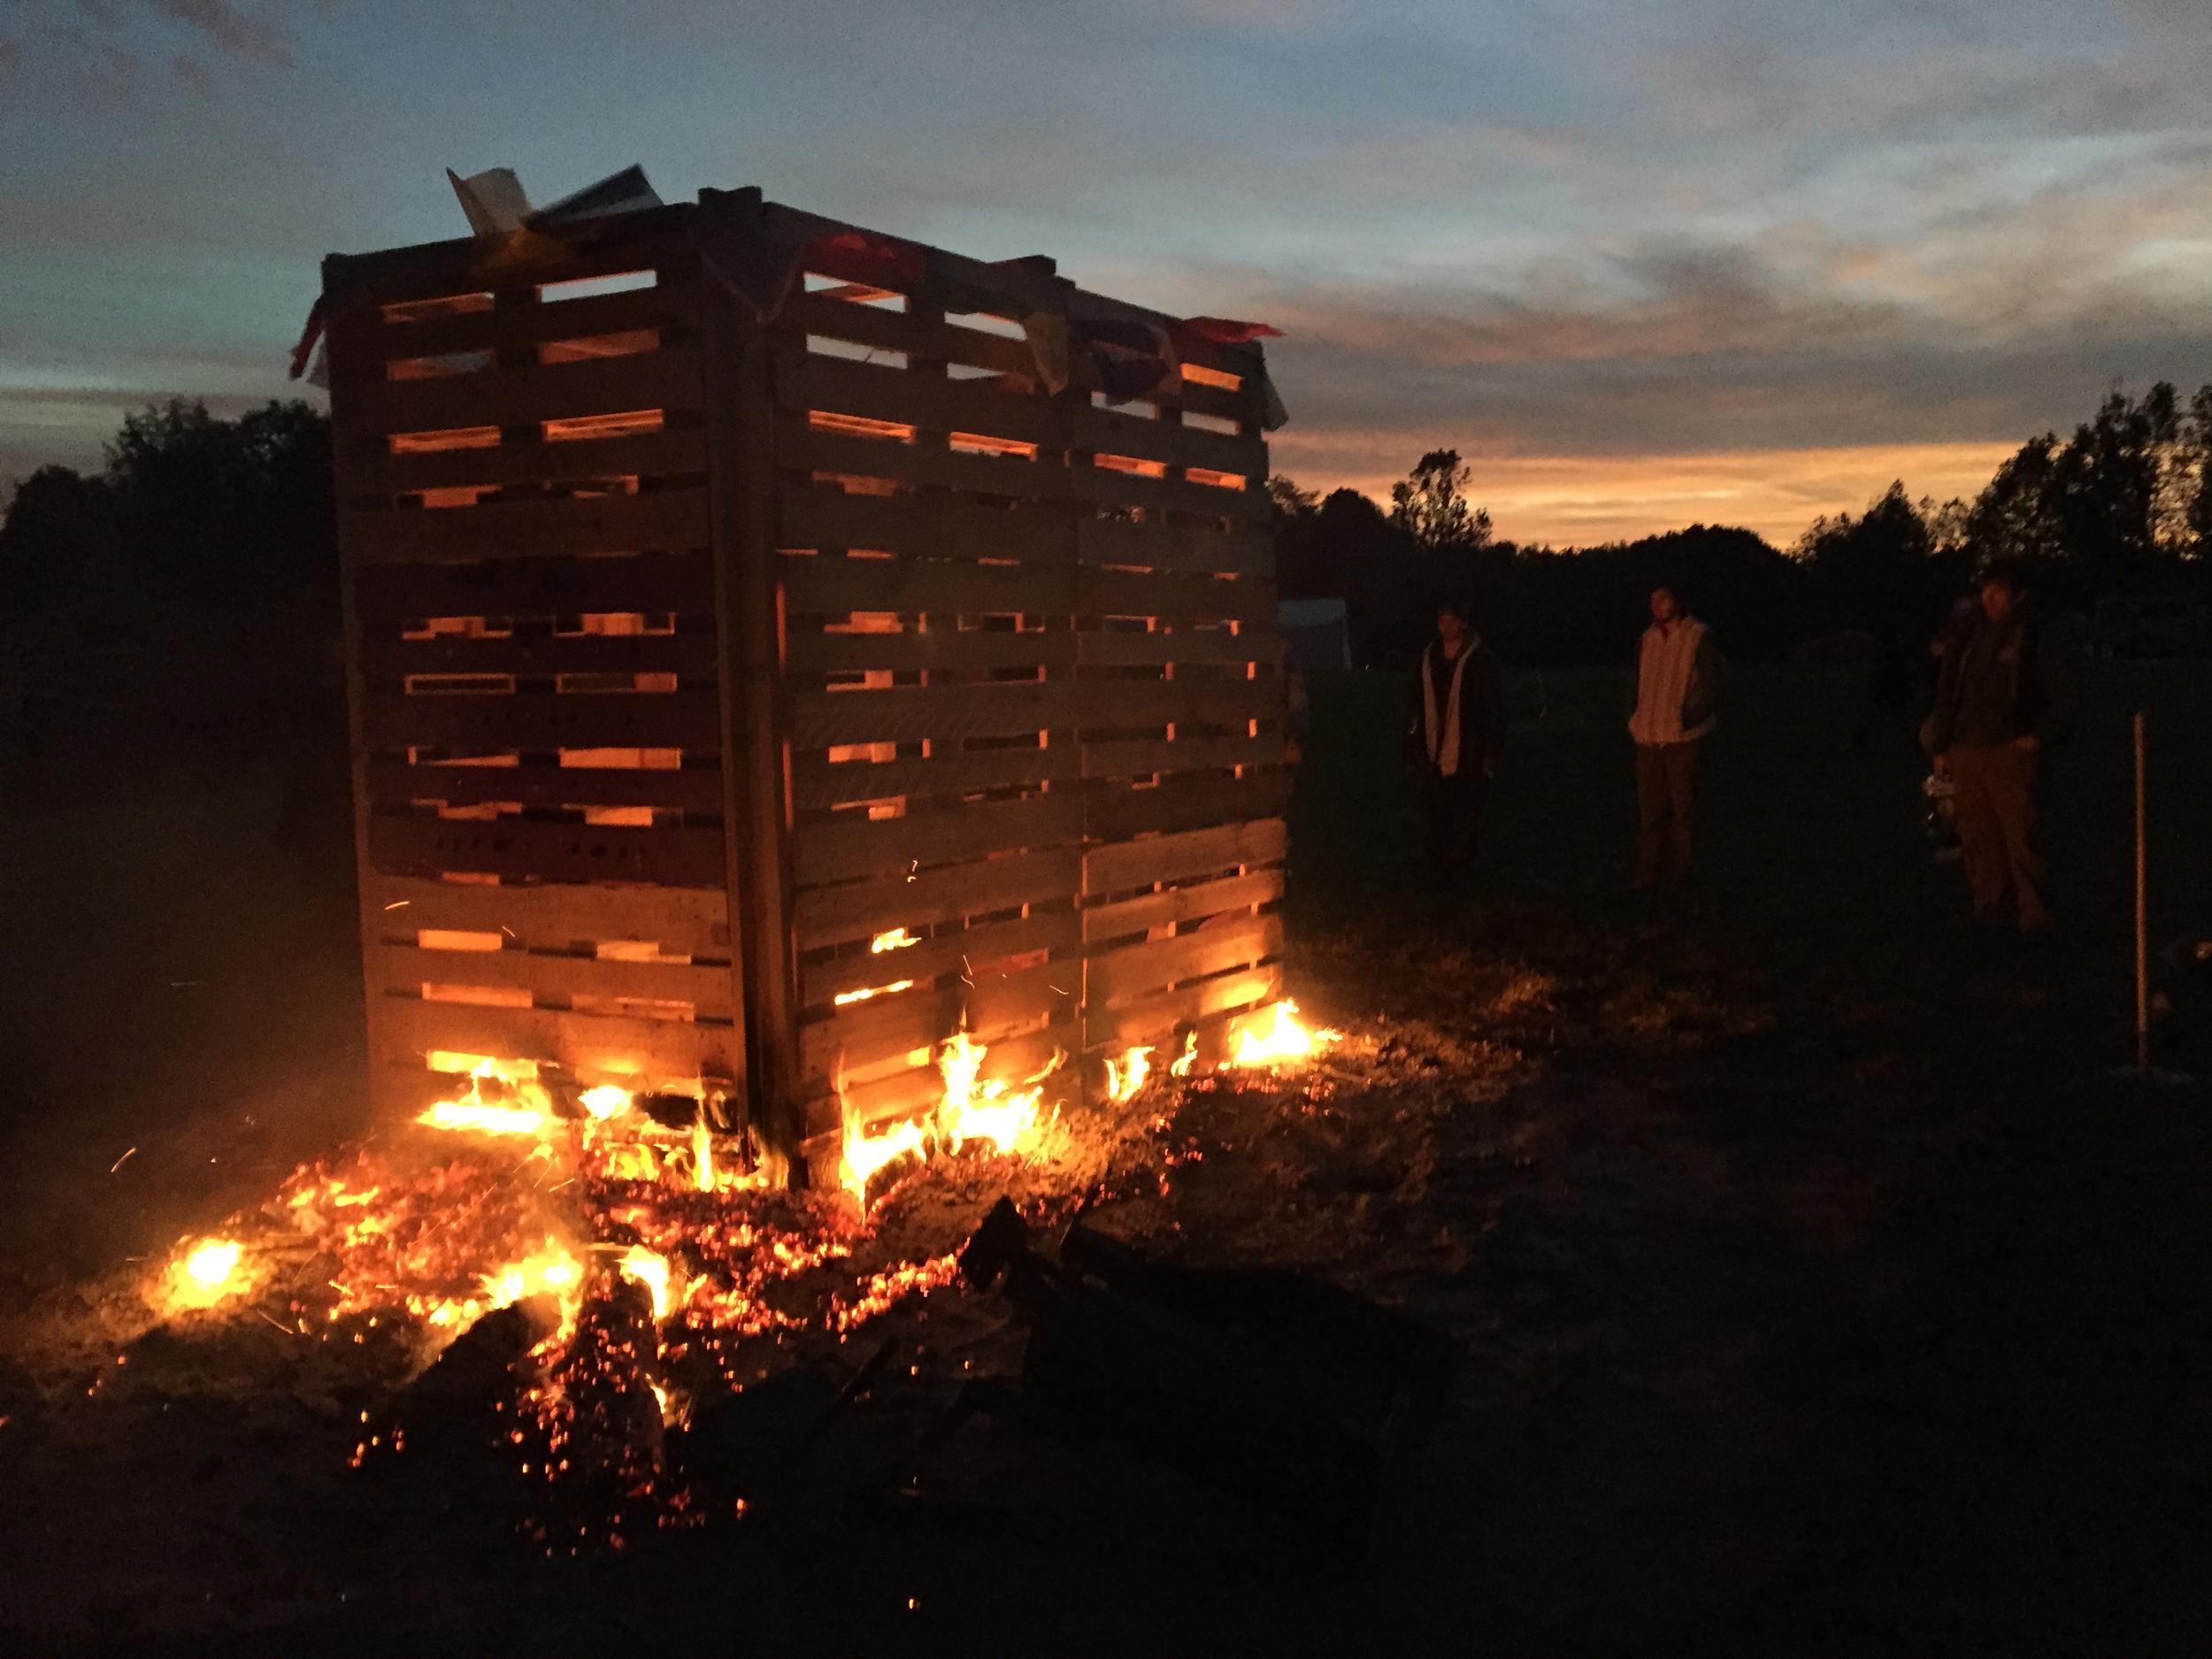 Temple burn at dawn, Mosaic 2015